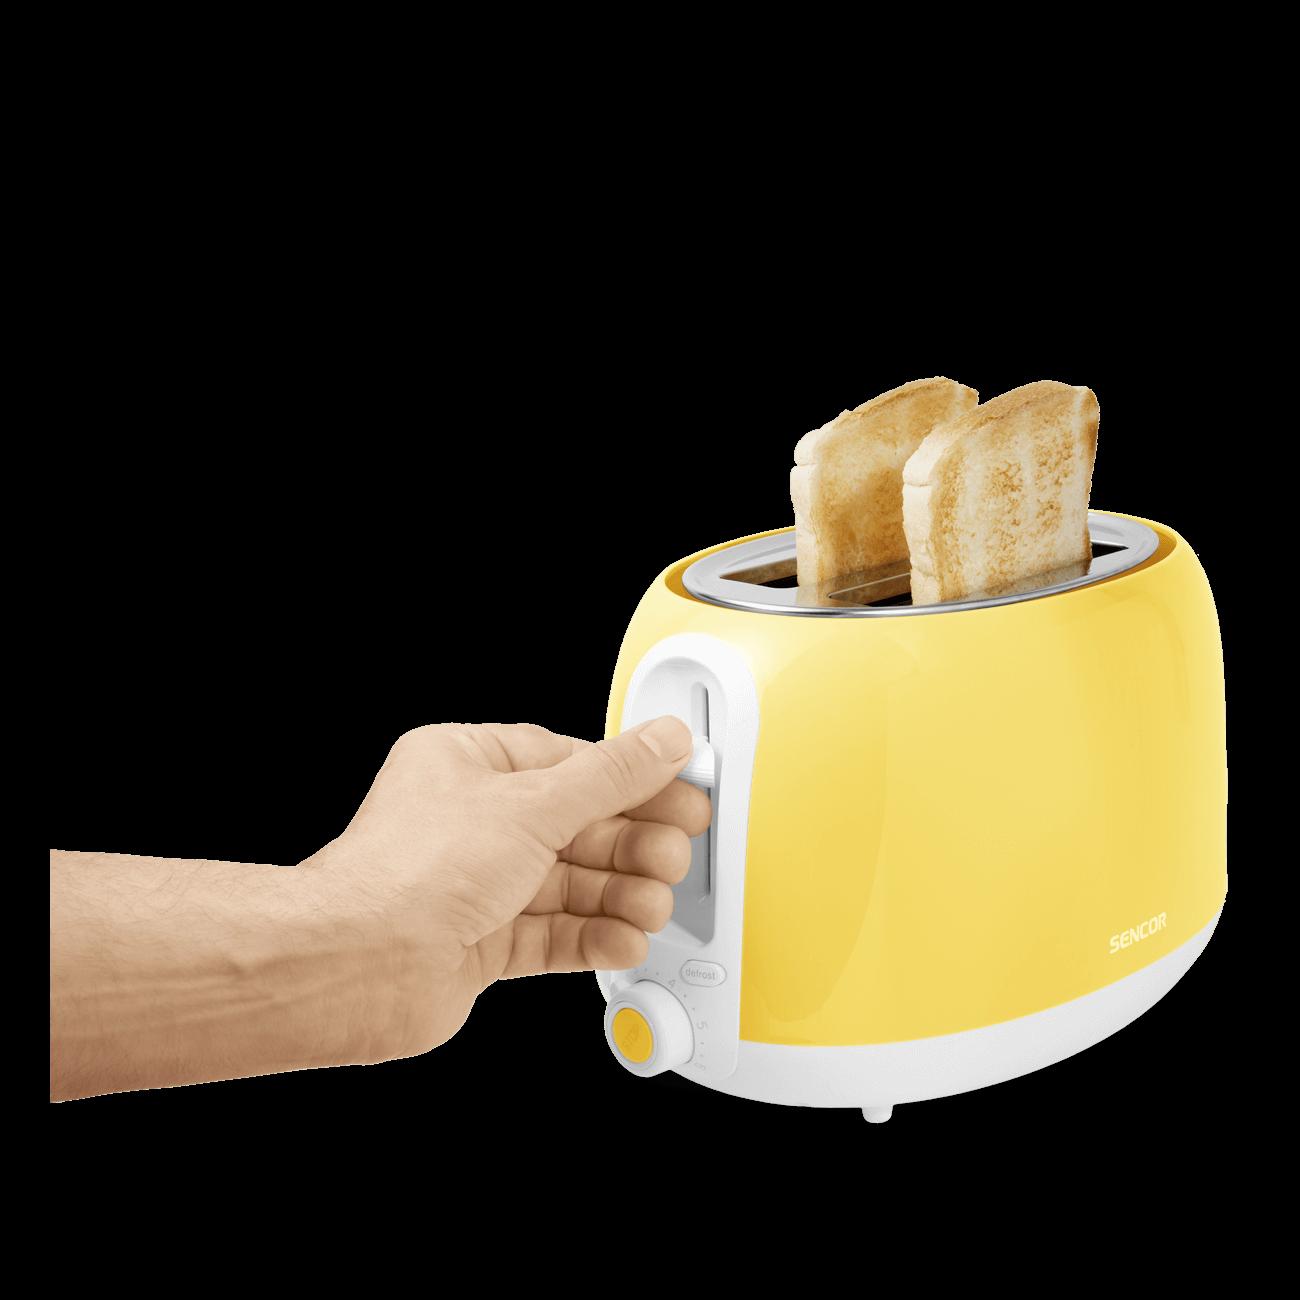 Sencor 2 Slice Toaster Bread Toasting Kitchen Electric Toast Pastel Lime Green